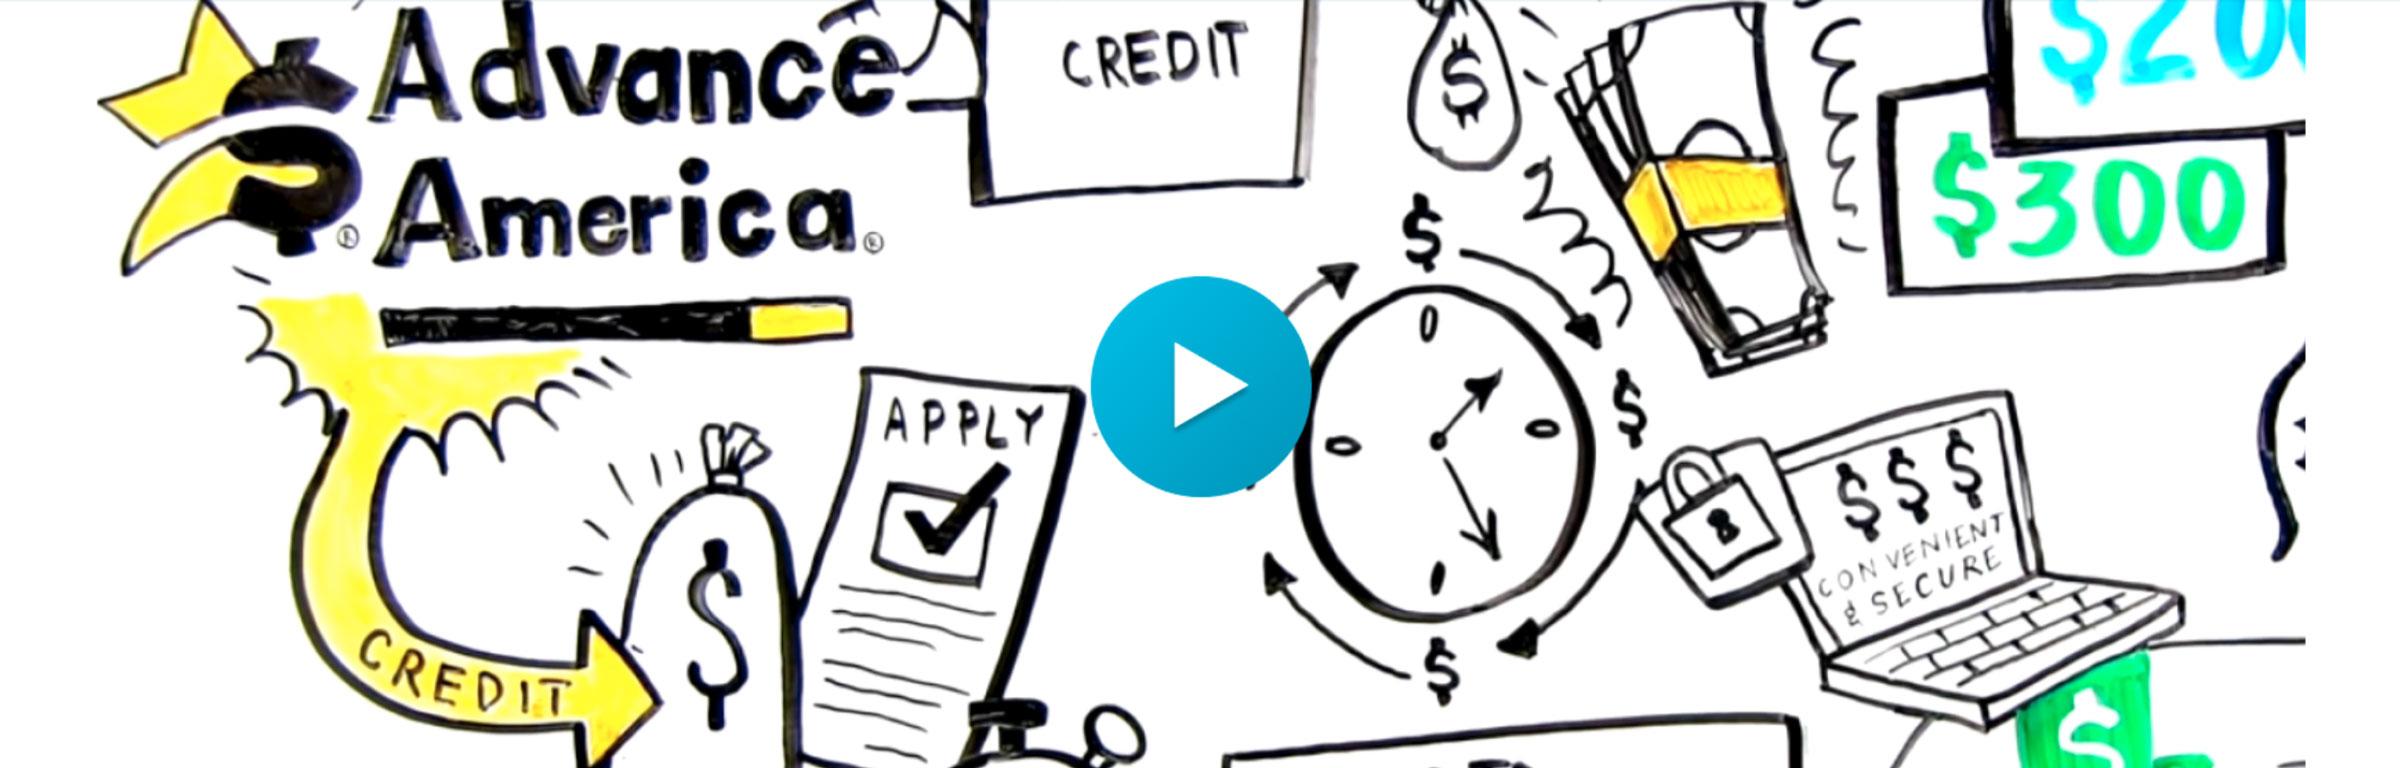 Advance America Line of Credit video thumbnail